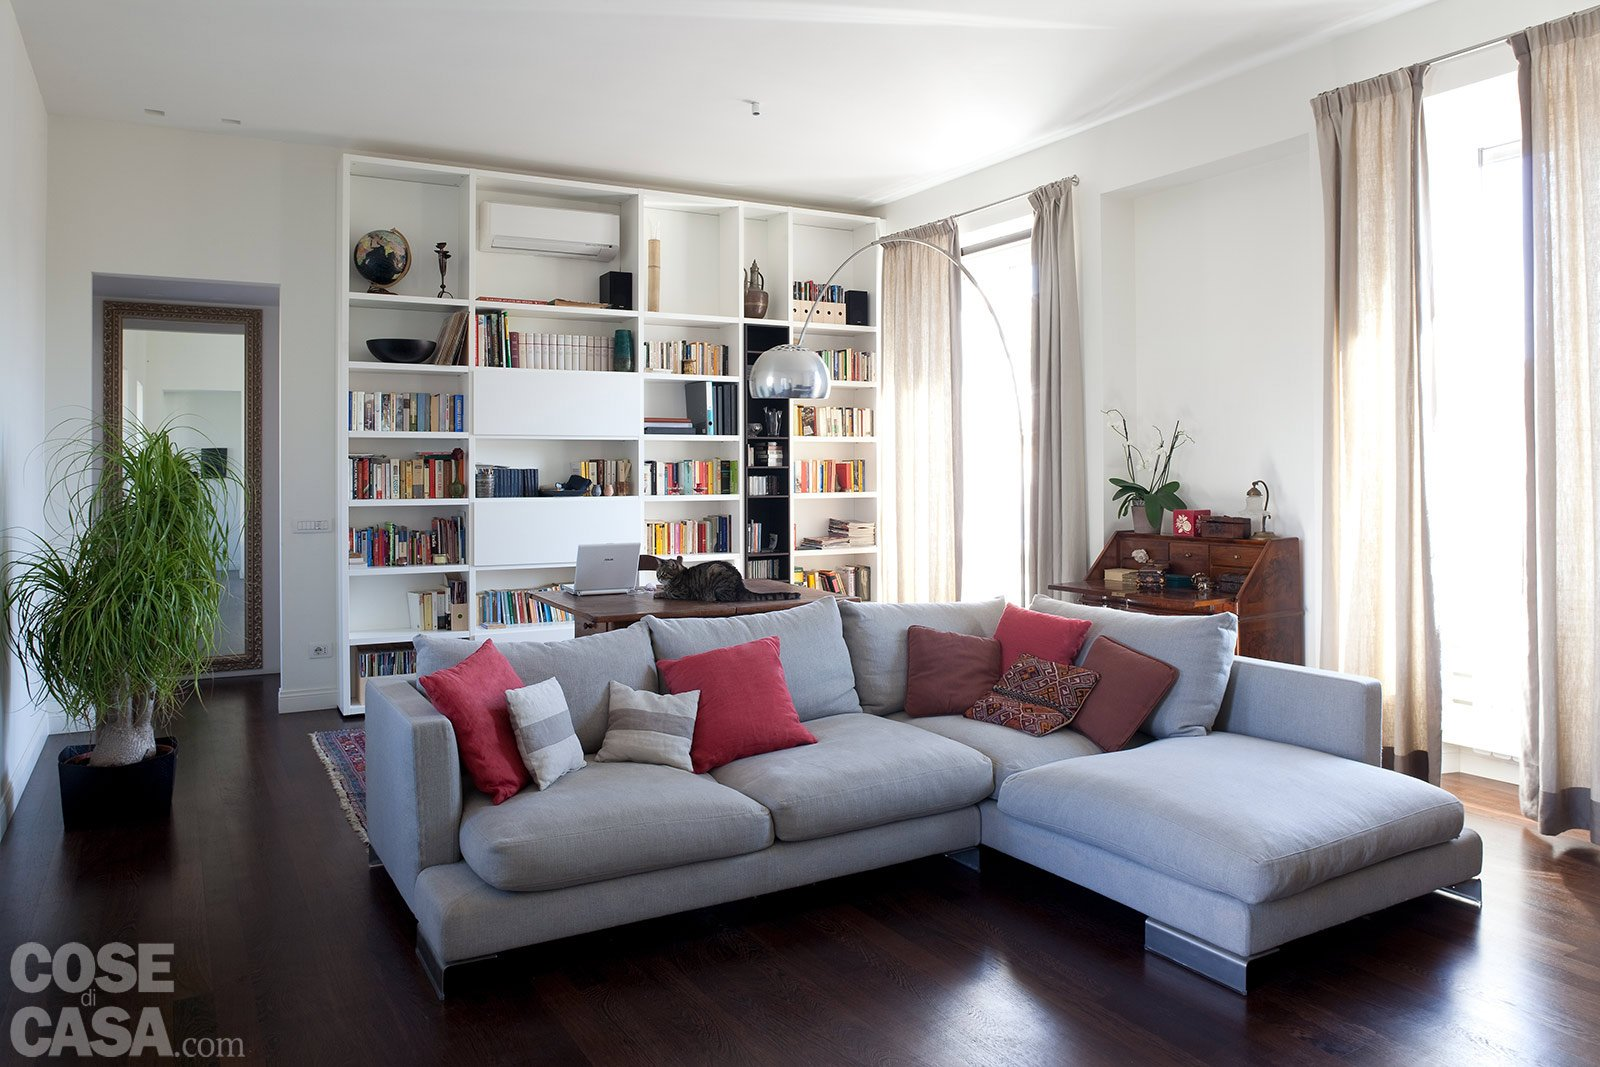 Casa 14 mq in pi per il bilocale cose di casa - Casa ikea 50 mq ...